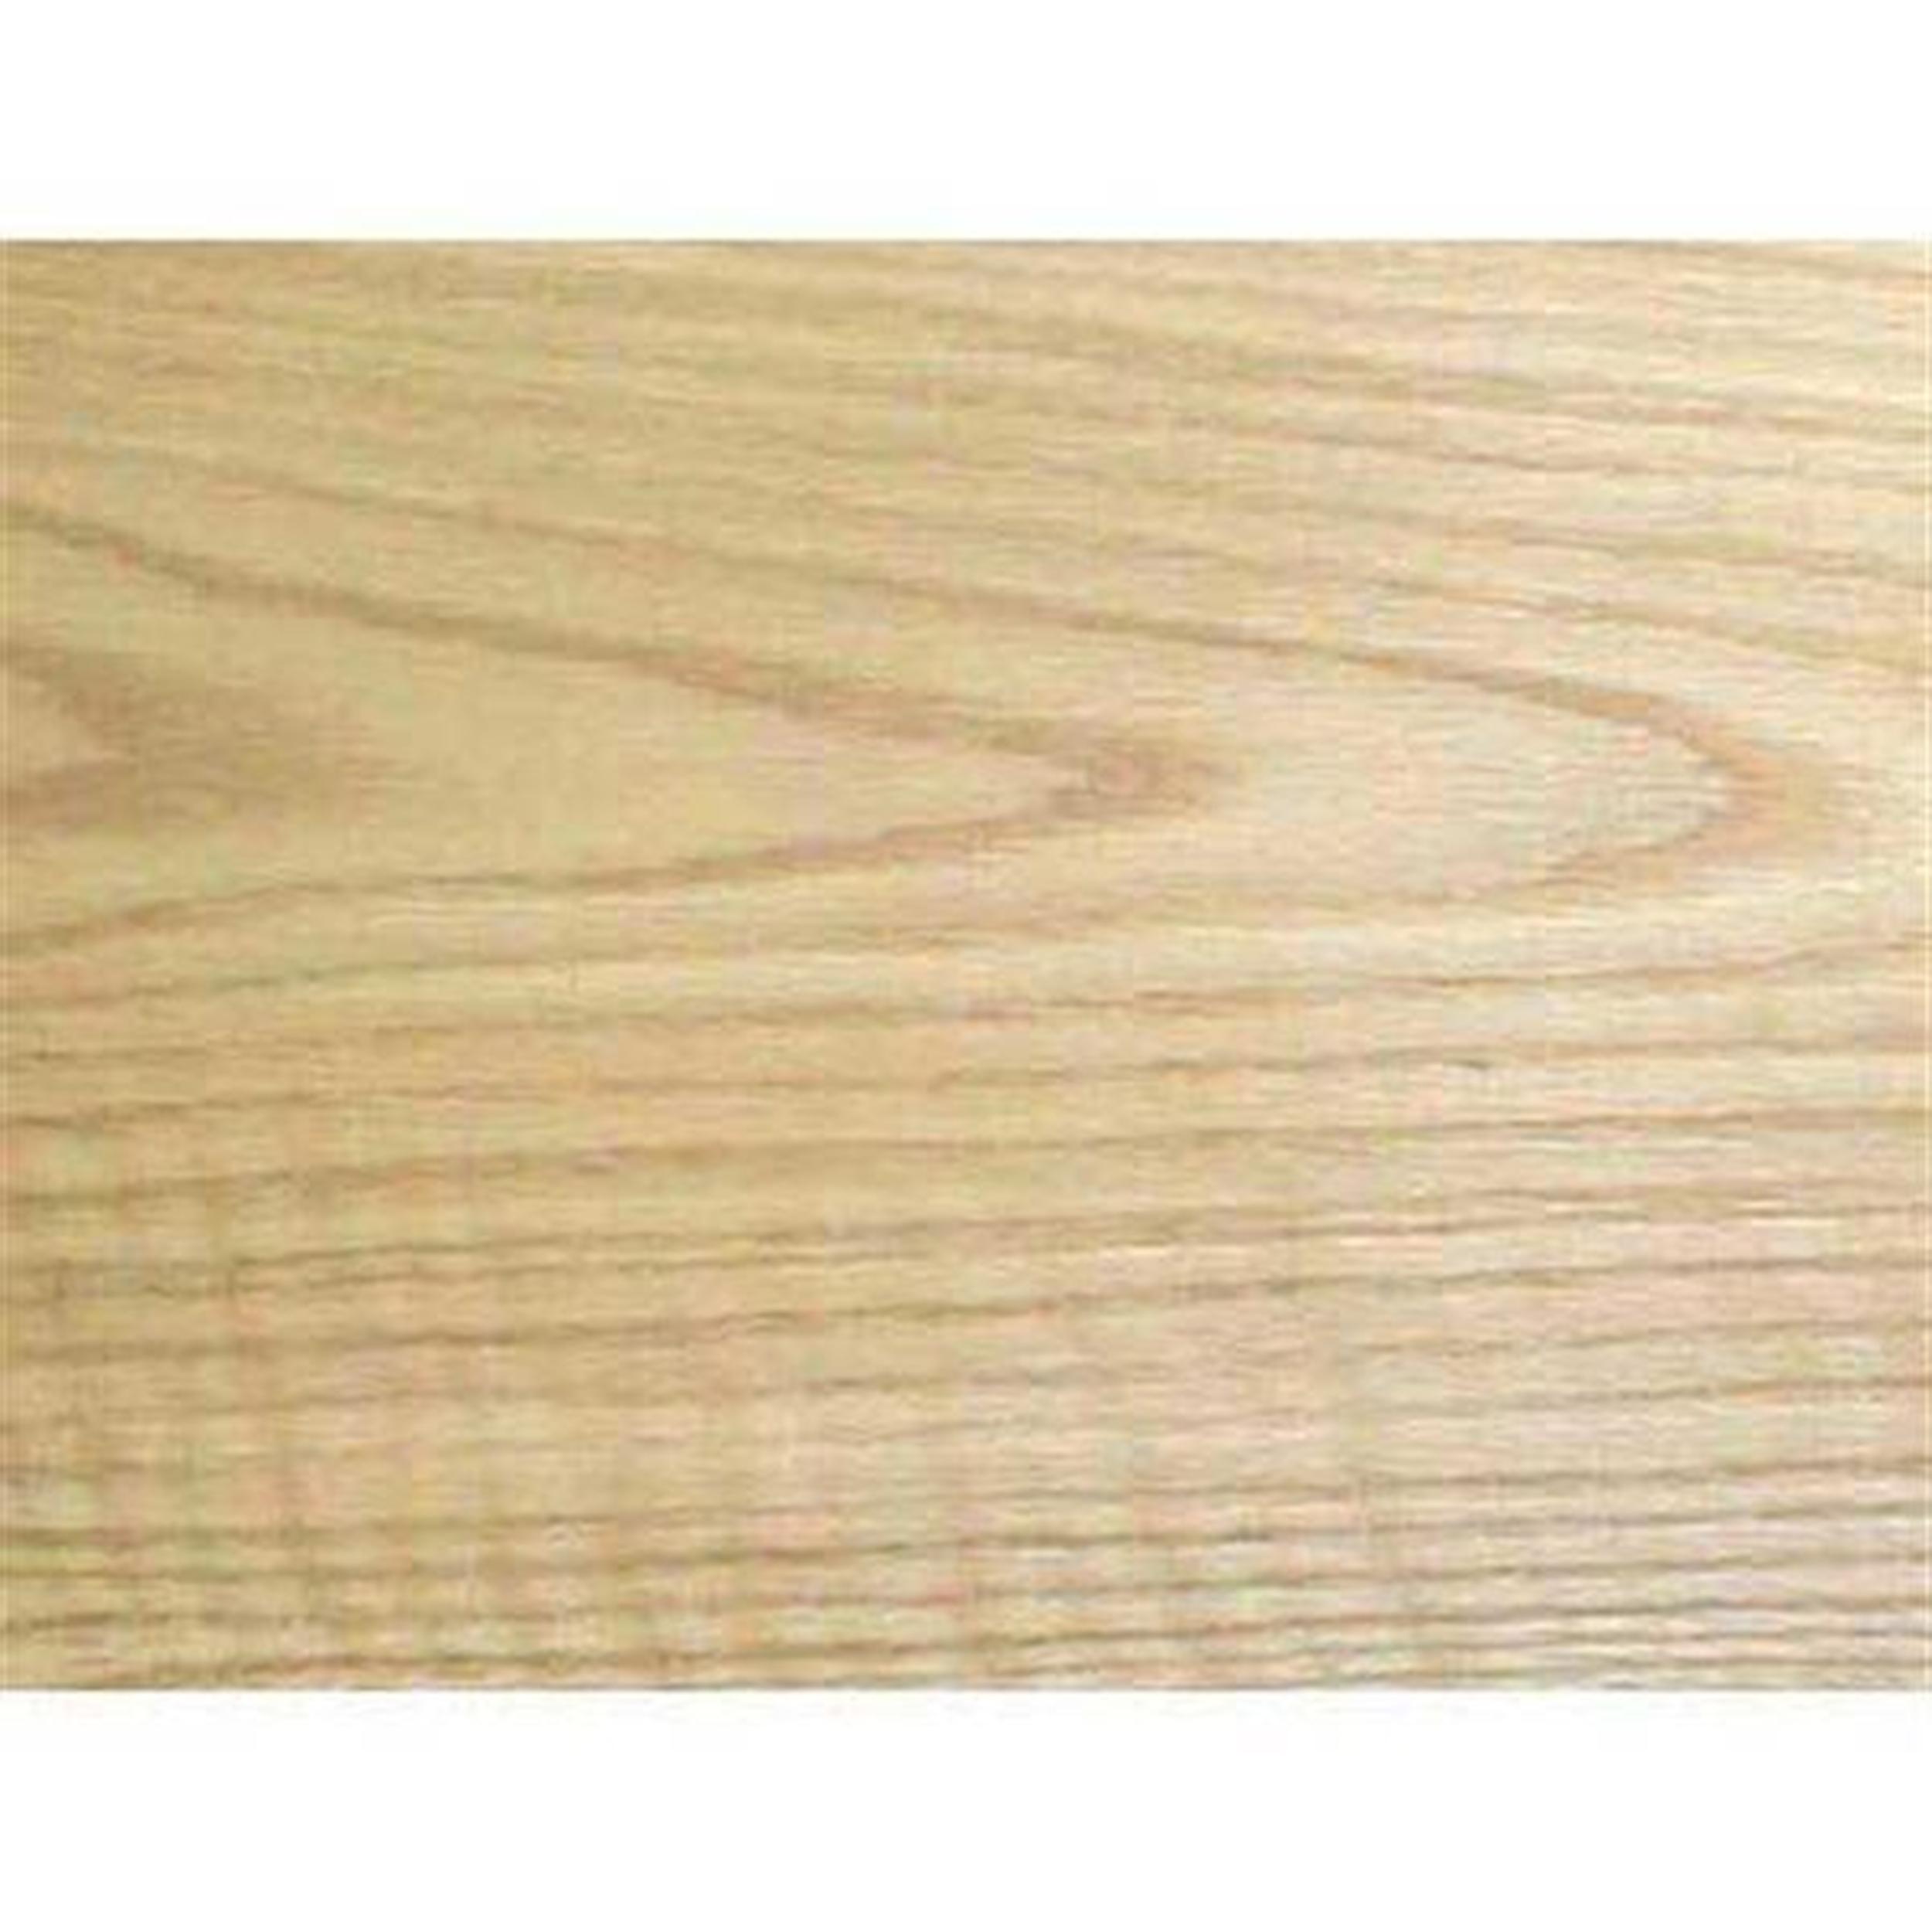 Oak, Red 2' x 8' 3M? PSA Backed Flat Cut Wood Veneer